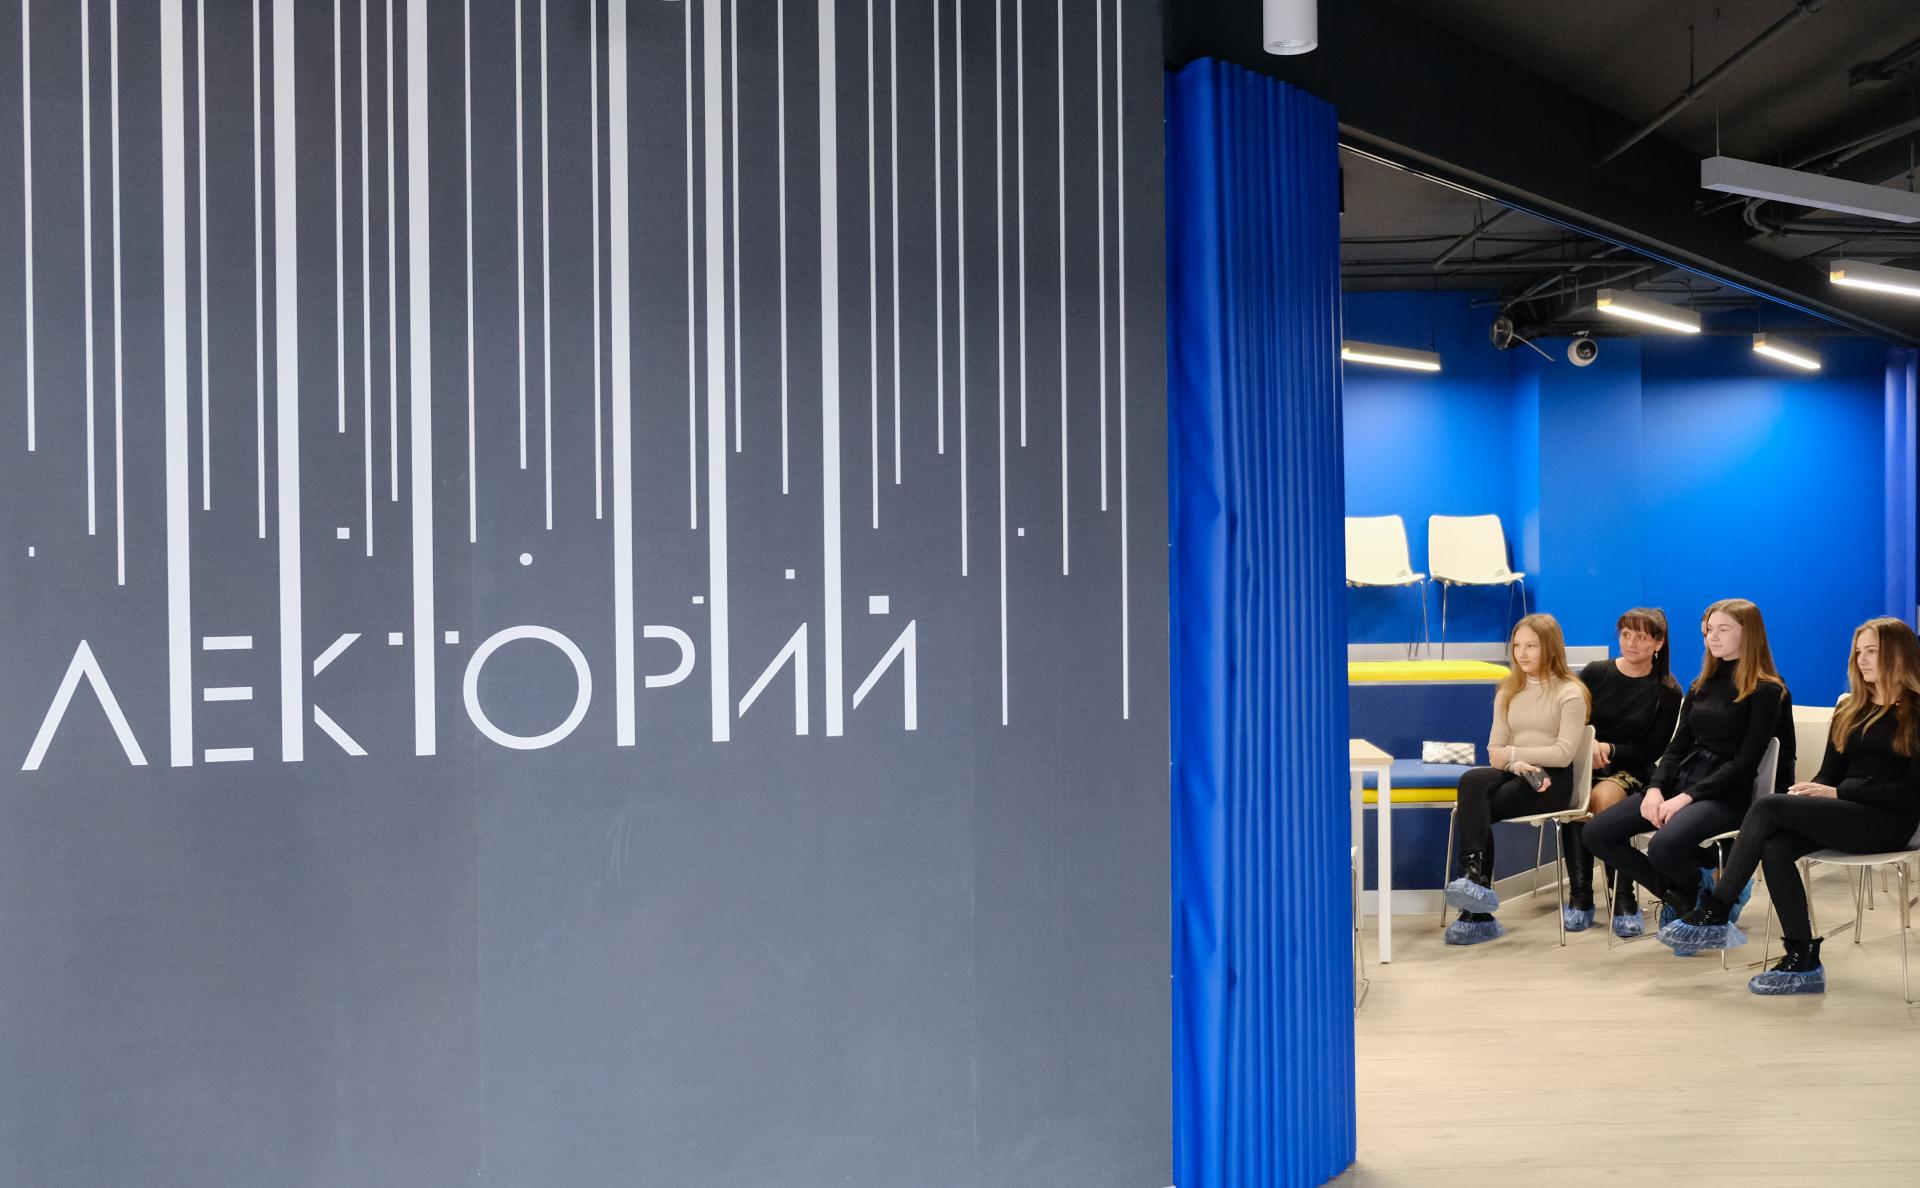 Фото: Кристина Бражникова / ТАСС